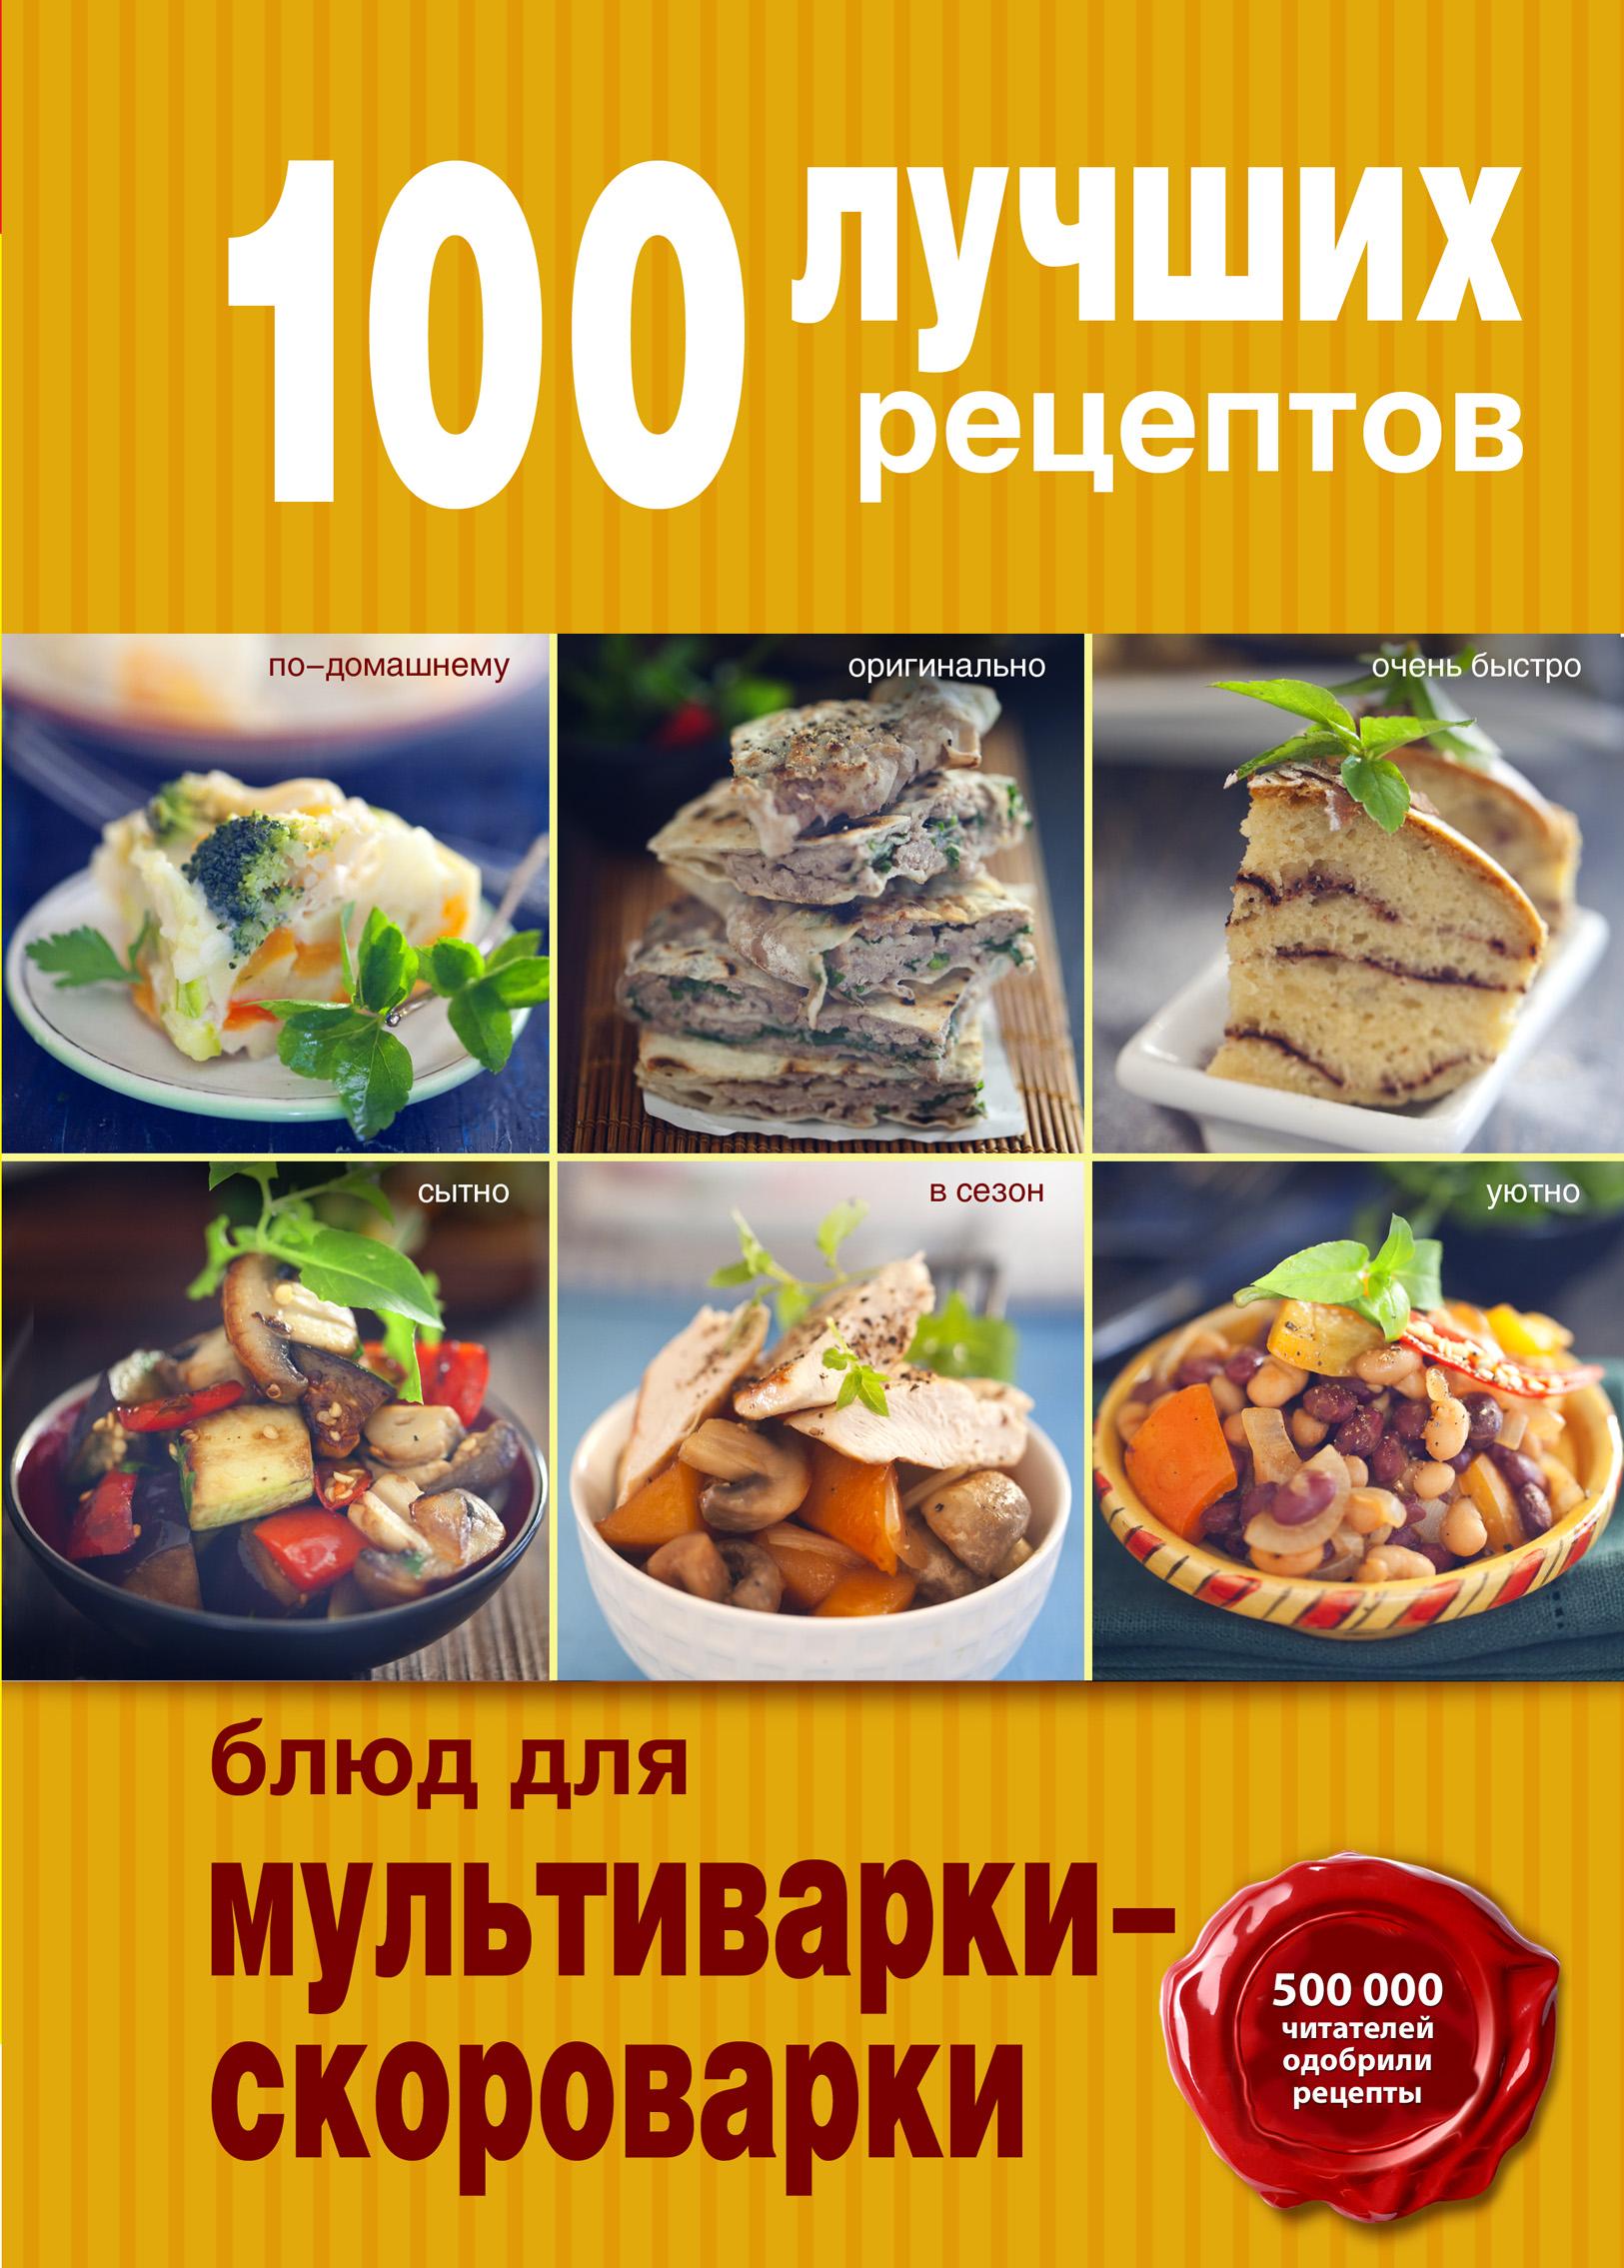 100 лучших рецептов блюд для мультиварки-скороварки